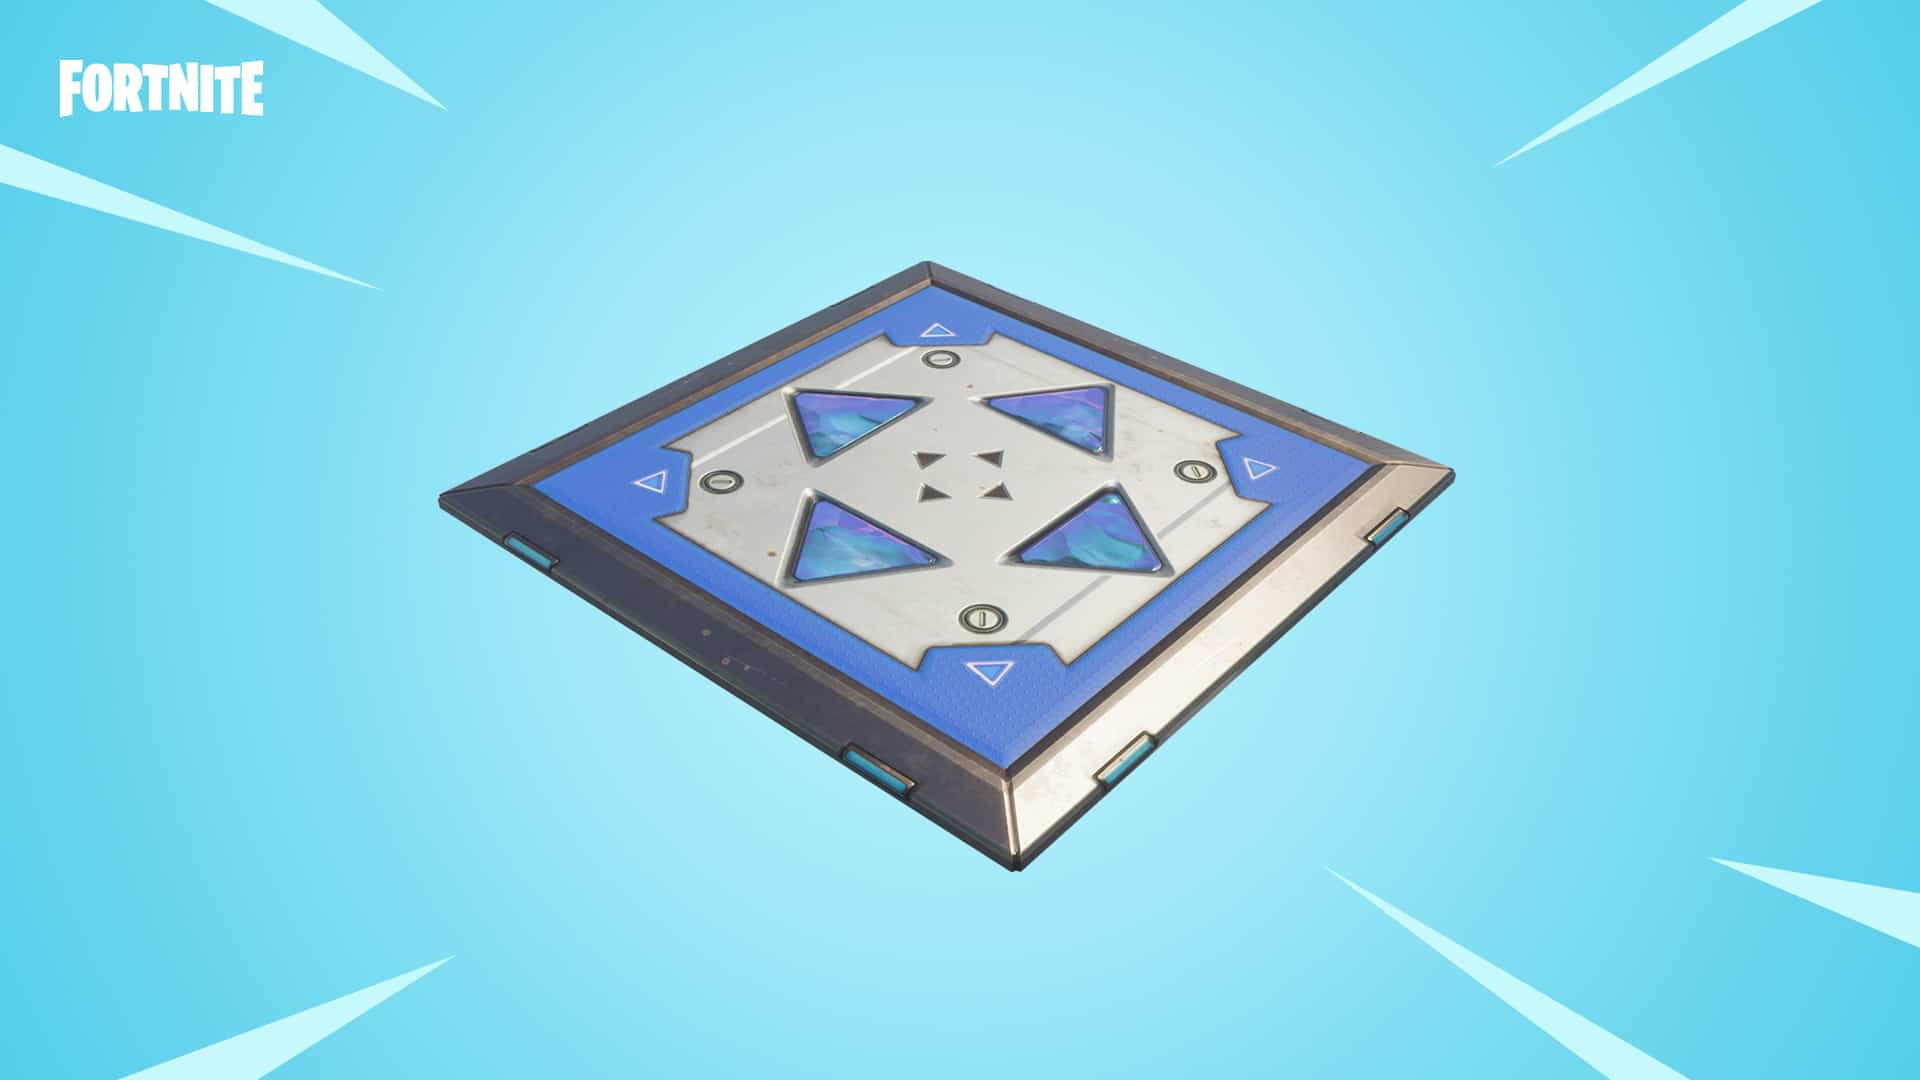 Fortnite bouncer trap